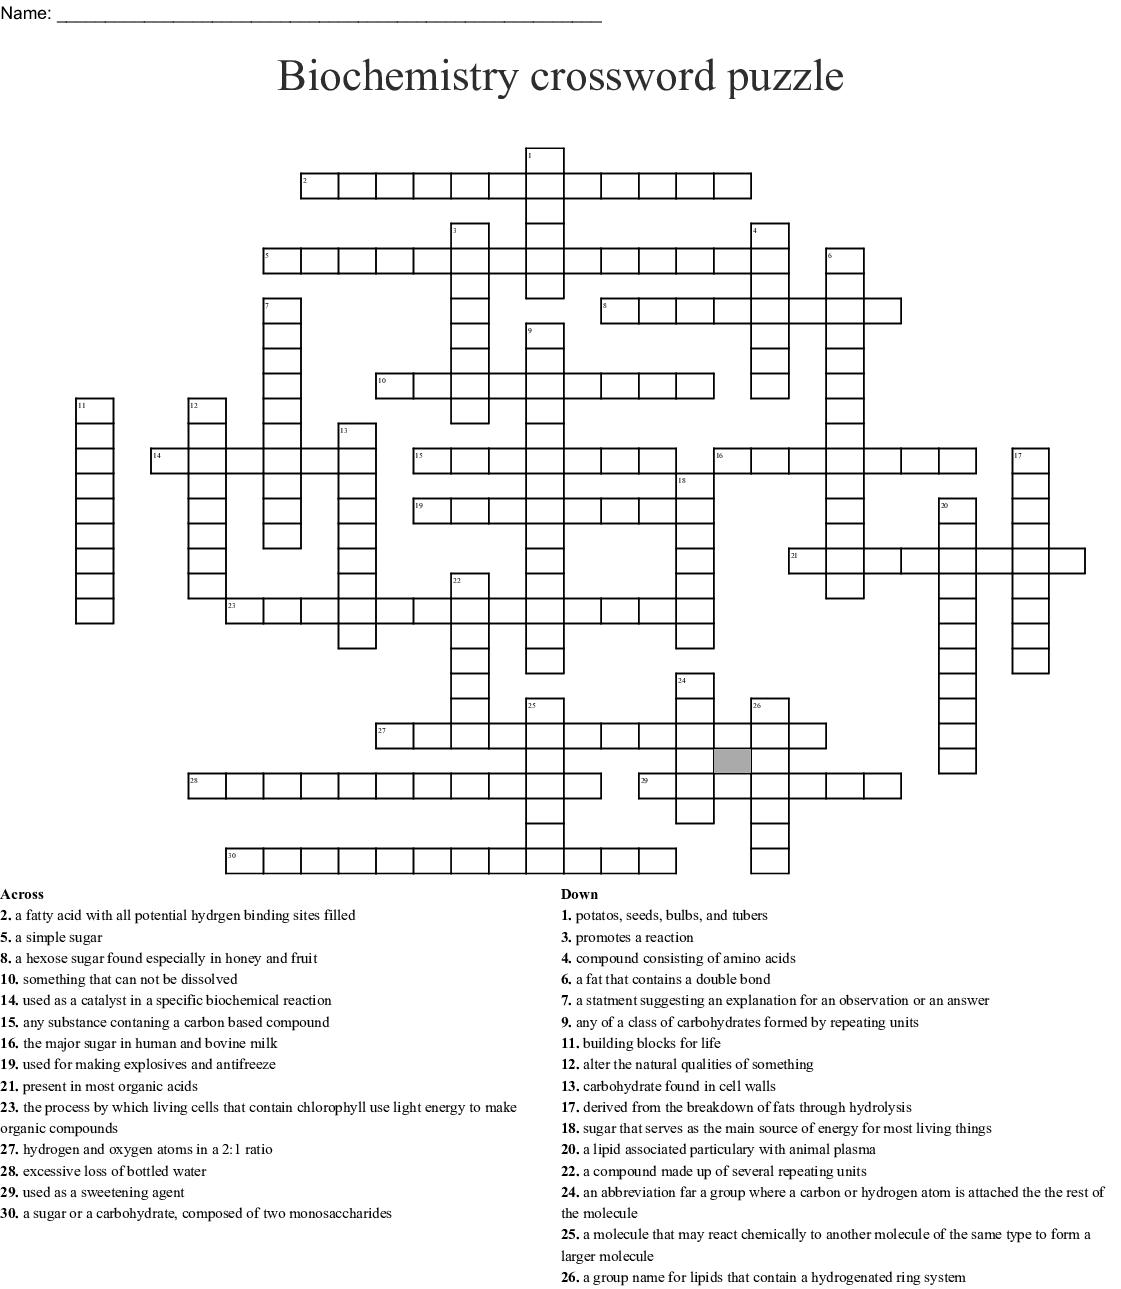 Biochemistry The Composition Of Living Matter Worksheet